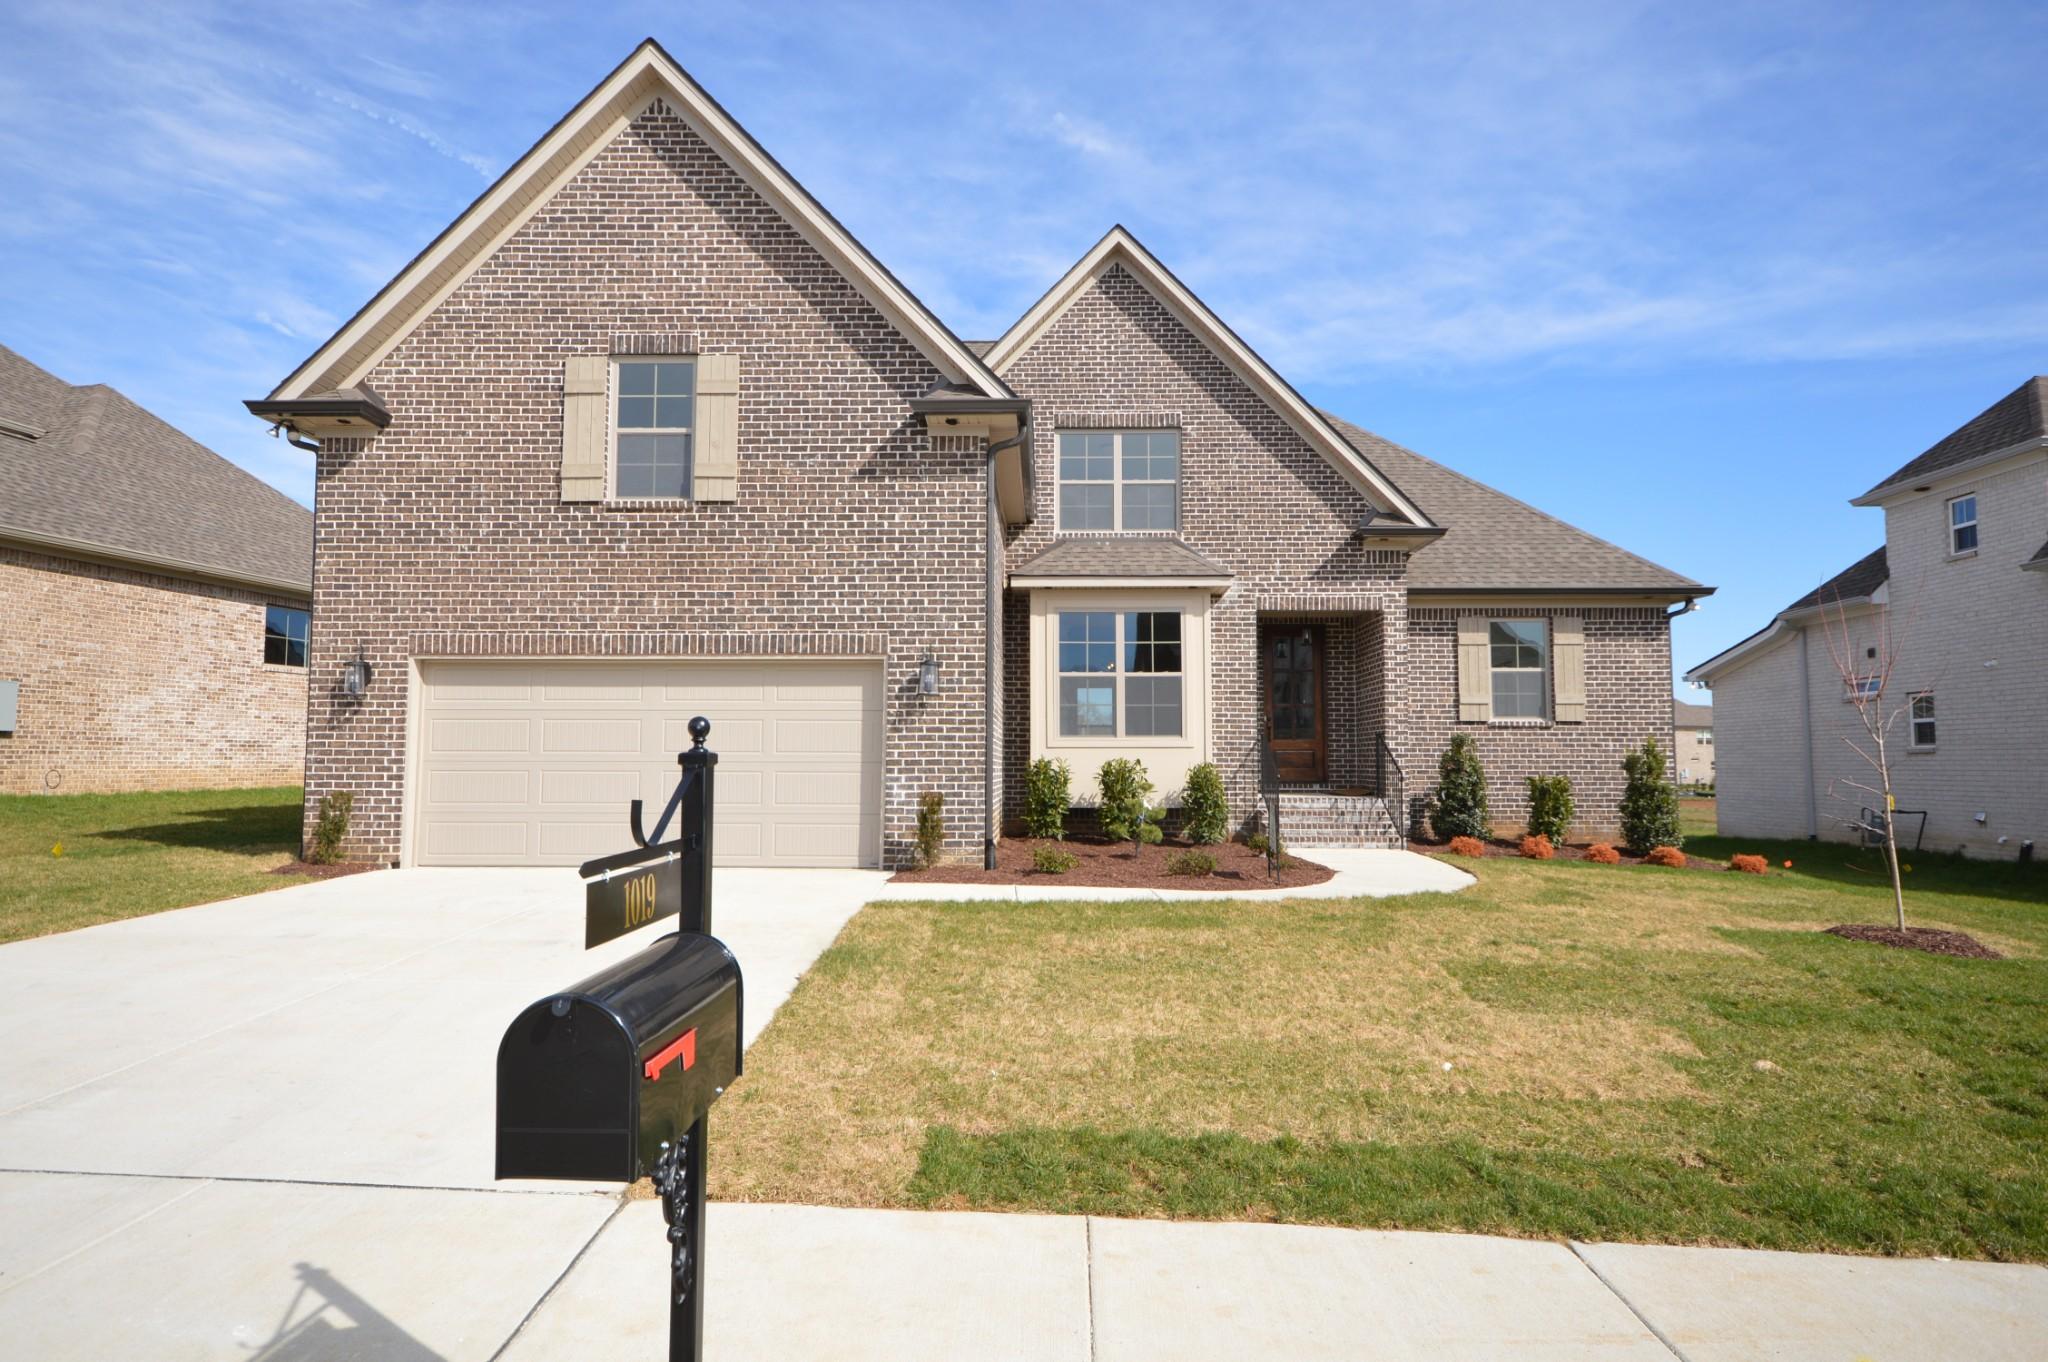 1019 Alpaca Drive (403), Spring Hill, TN 37174 - Spring Hill, TN real estate listing